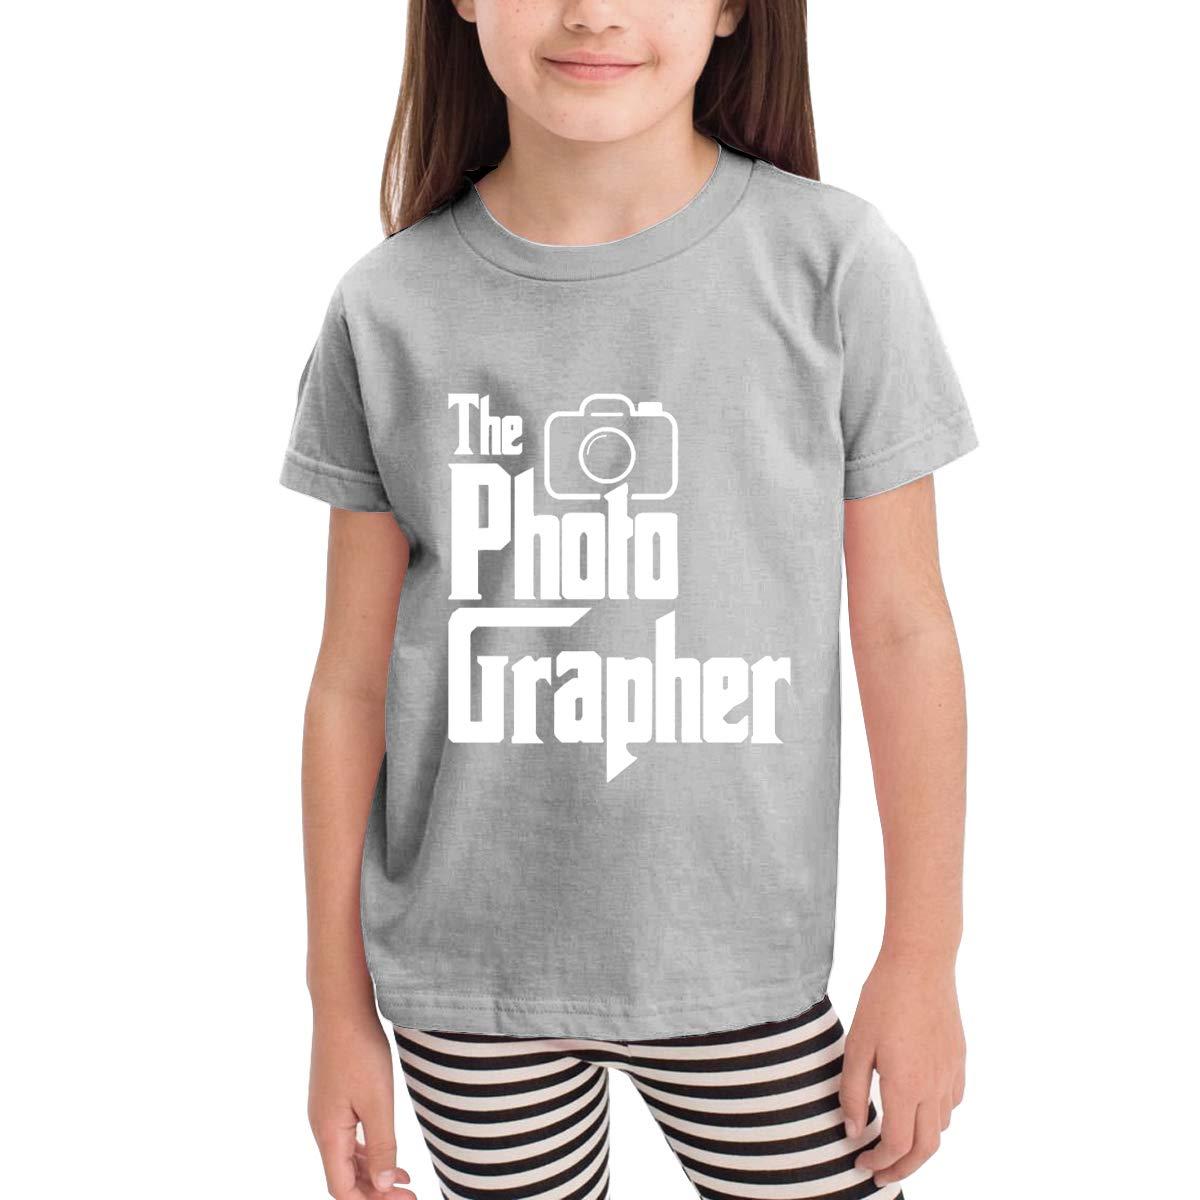 Kids T-Shirt Tops Black The Photographer Unisex Youths Short Sleeve T-Shirt